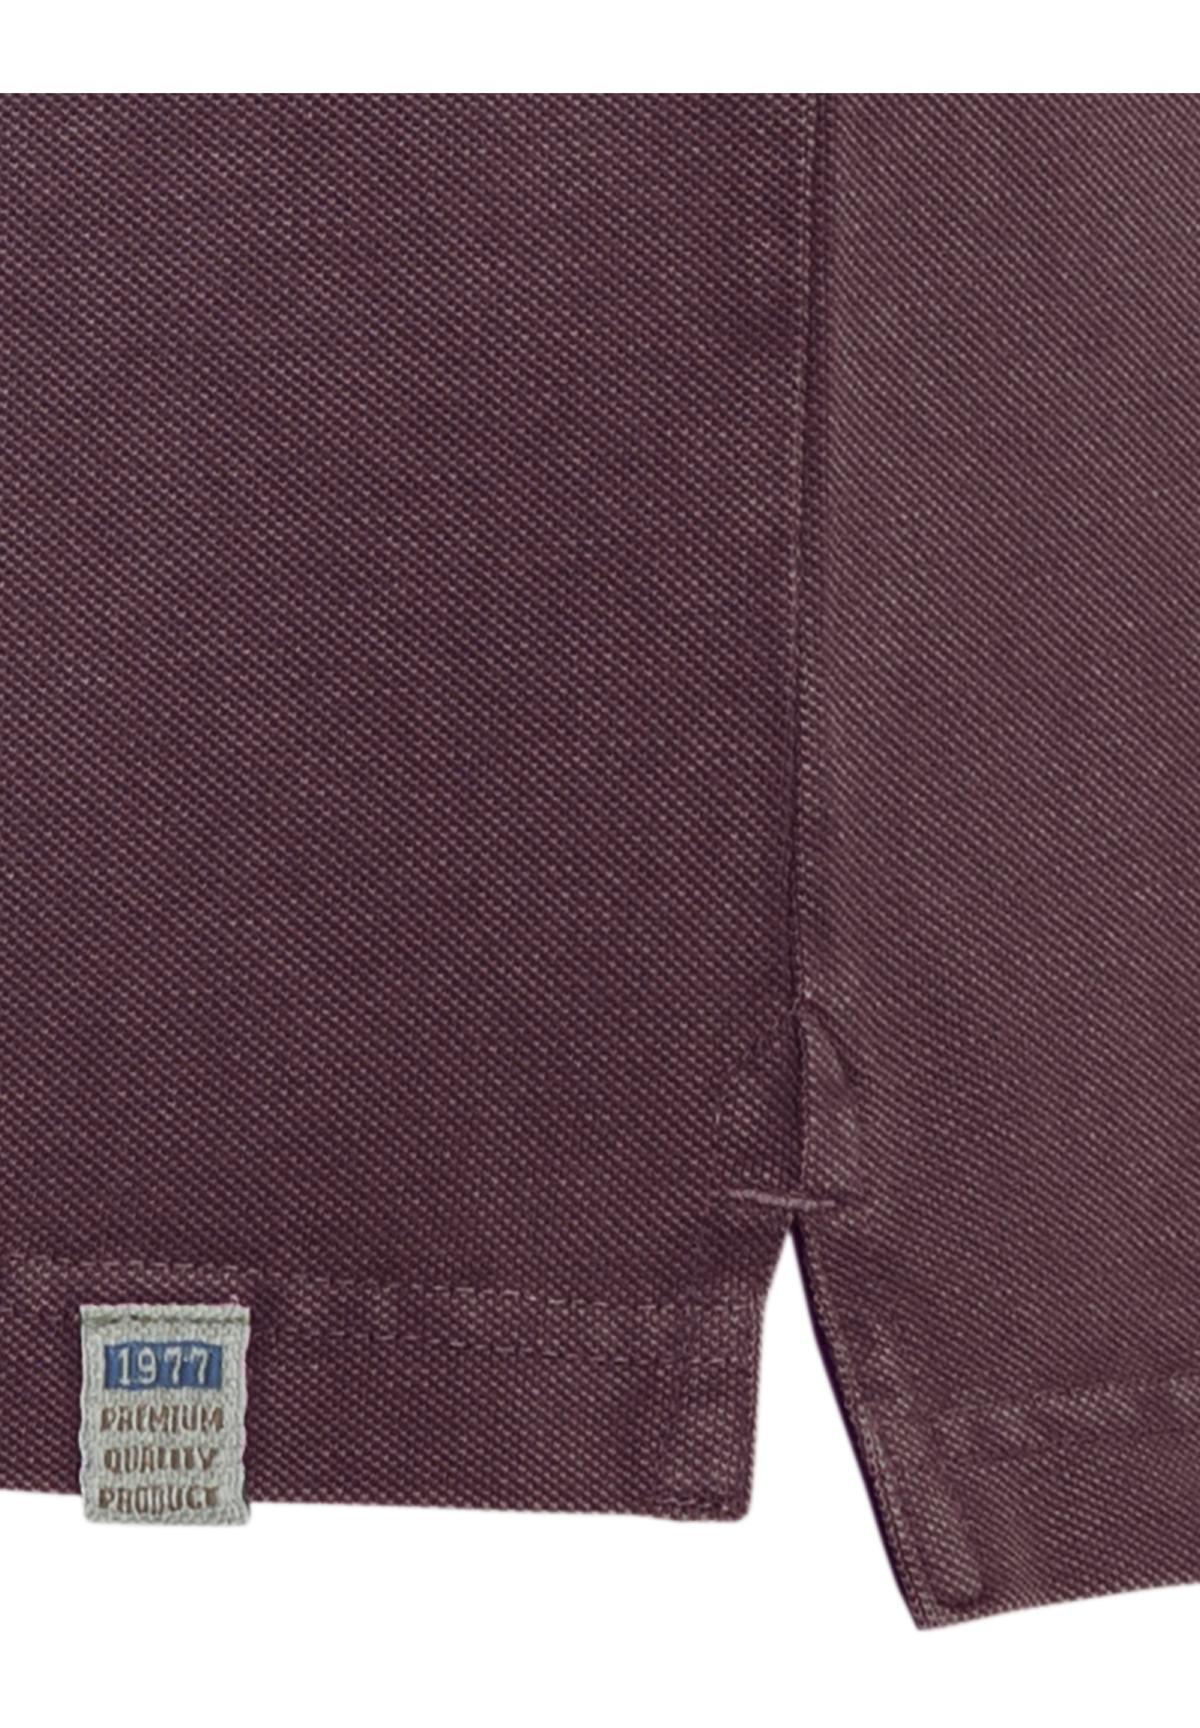 Camel-Active-Herren-Shirt-Poloshirt-Pique-Regular-Fit-NEU Indexbild 94